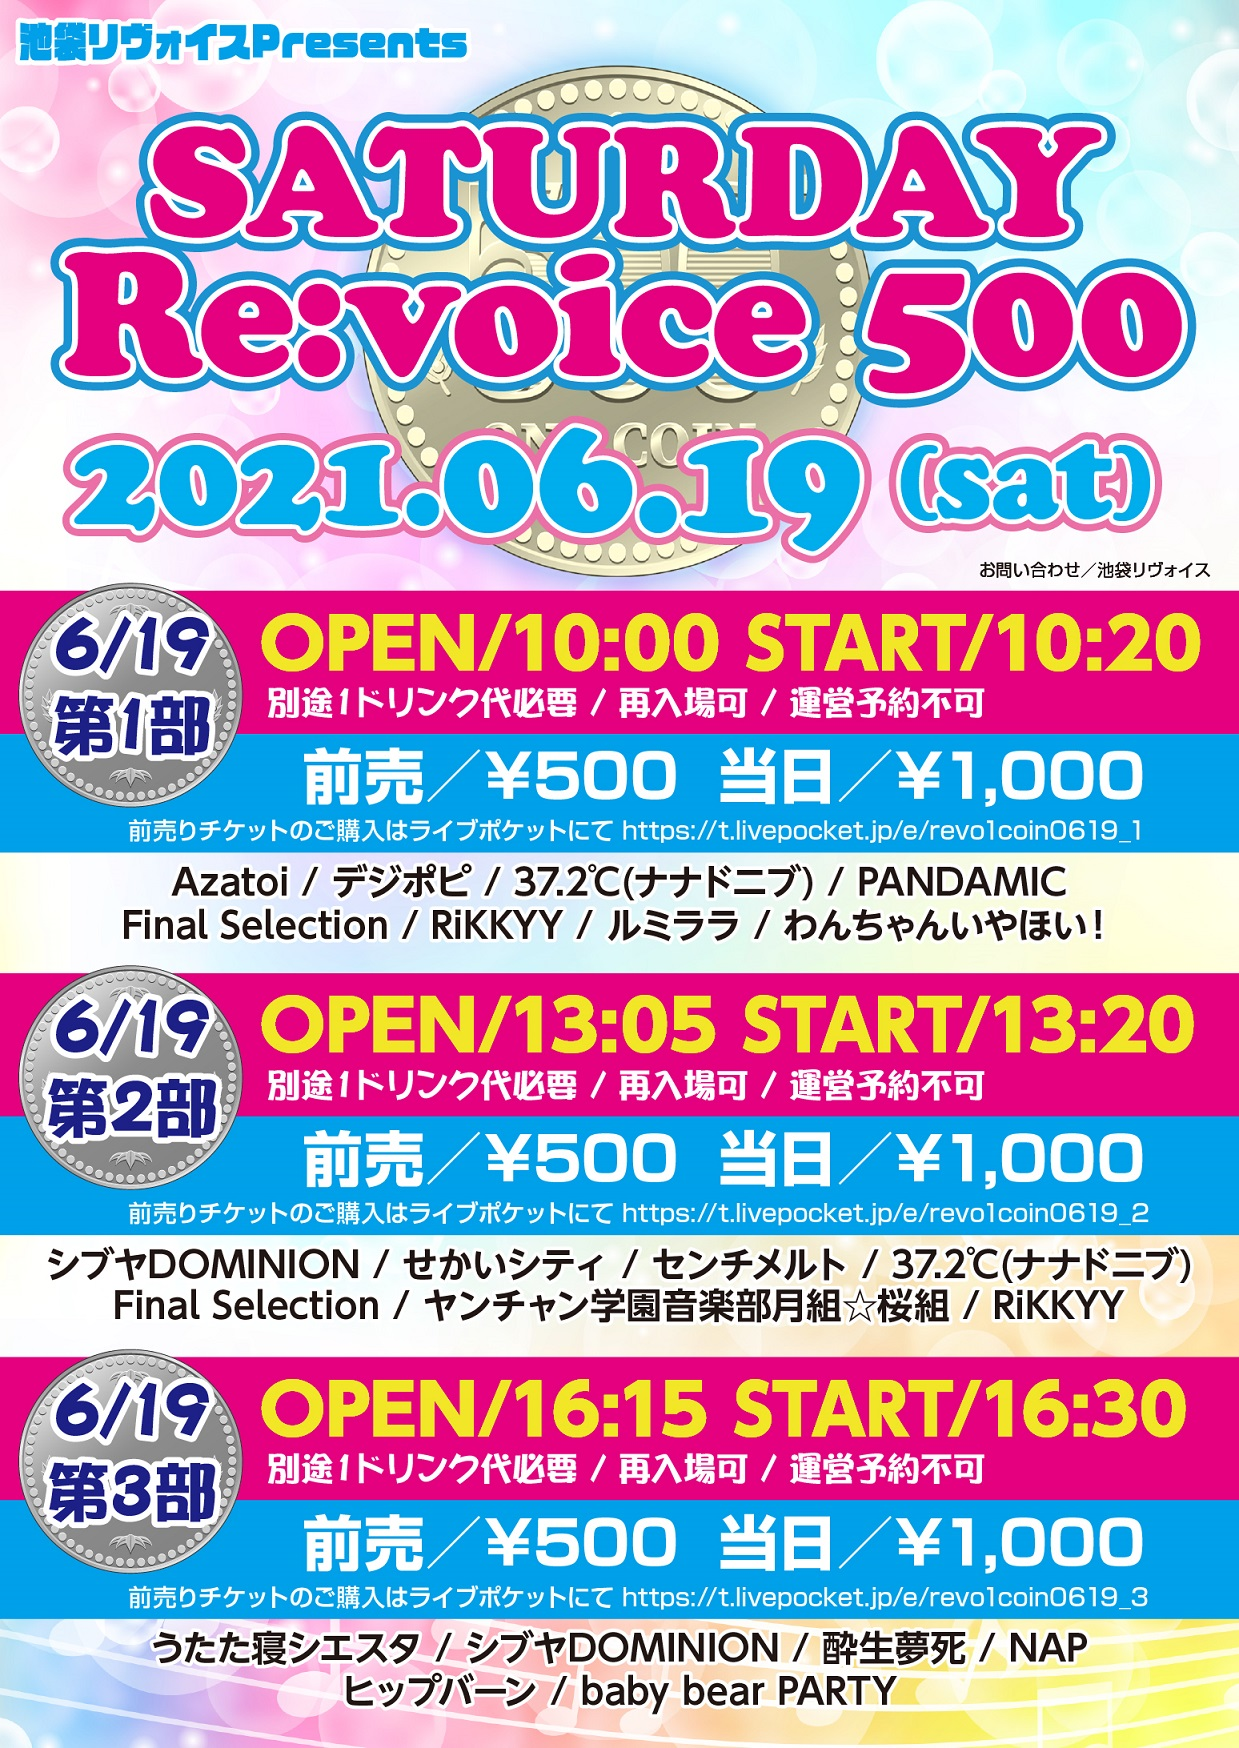 【第一部】SATURDAY Re:voice 500